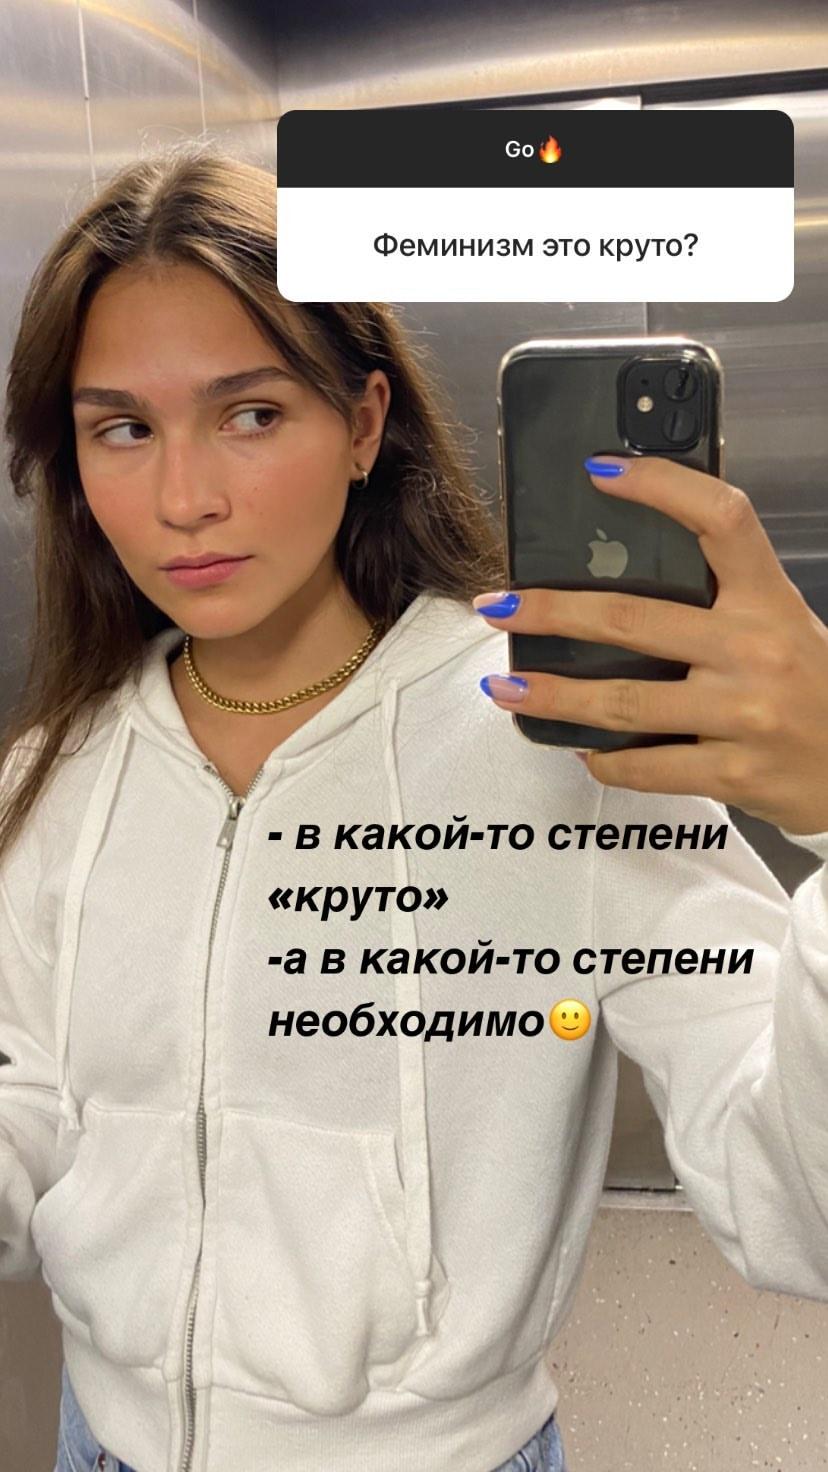 https://i5.imageban.ru/out/2021/08/12/ac1d23980cf277dd8a556661bdde915e.jpg